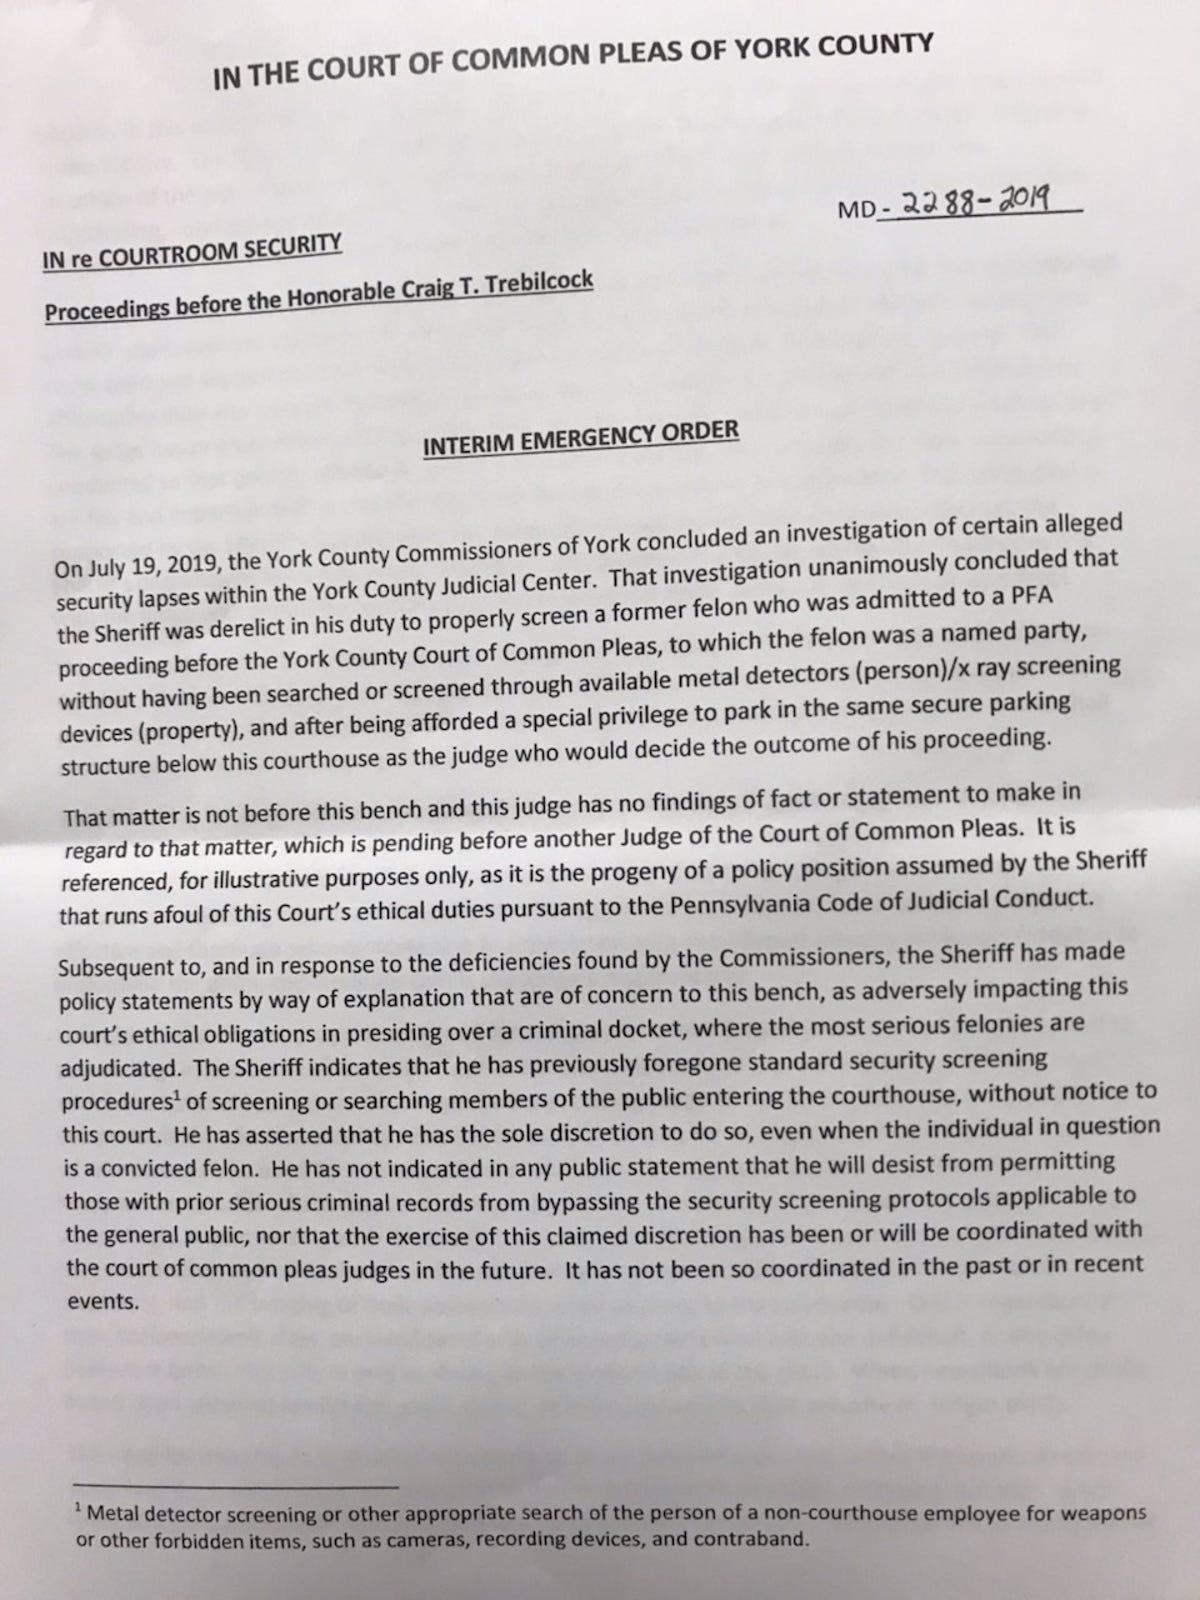 York County judge issues emergency order slamming sheriff's handling